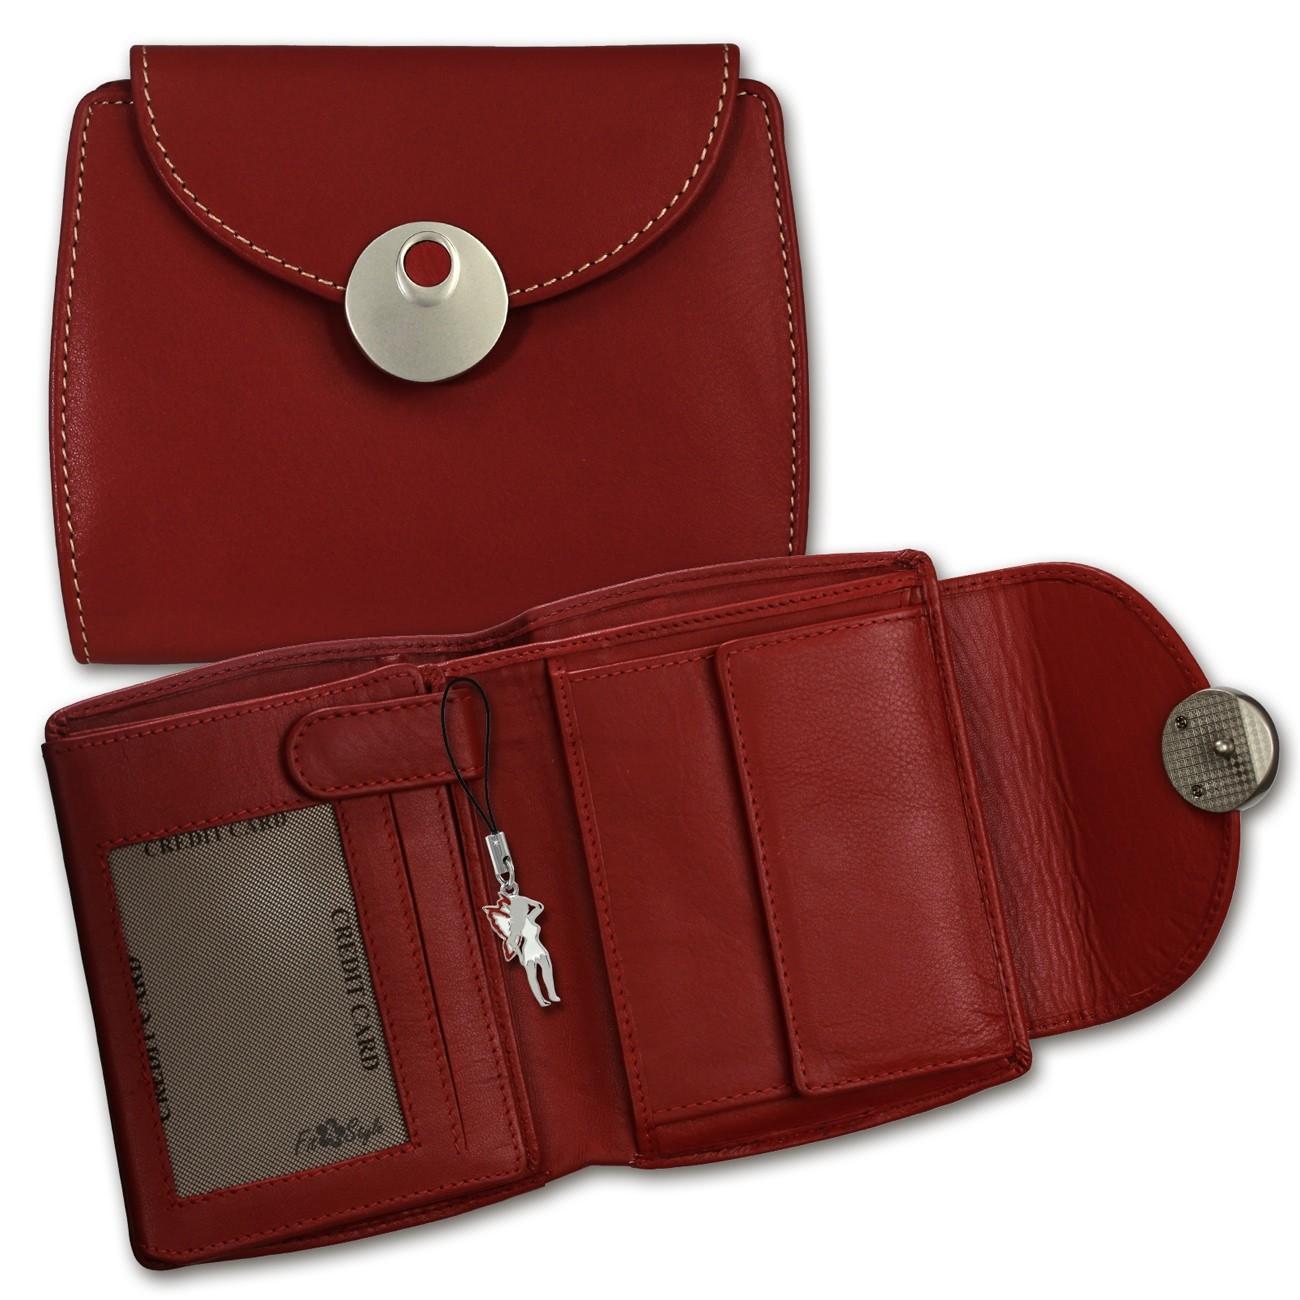 DrachenLeder Geldbörse rot Damen Portemonnaie Leder OPD105R